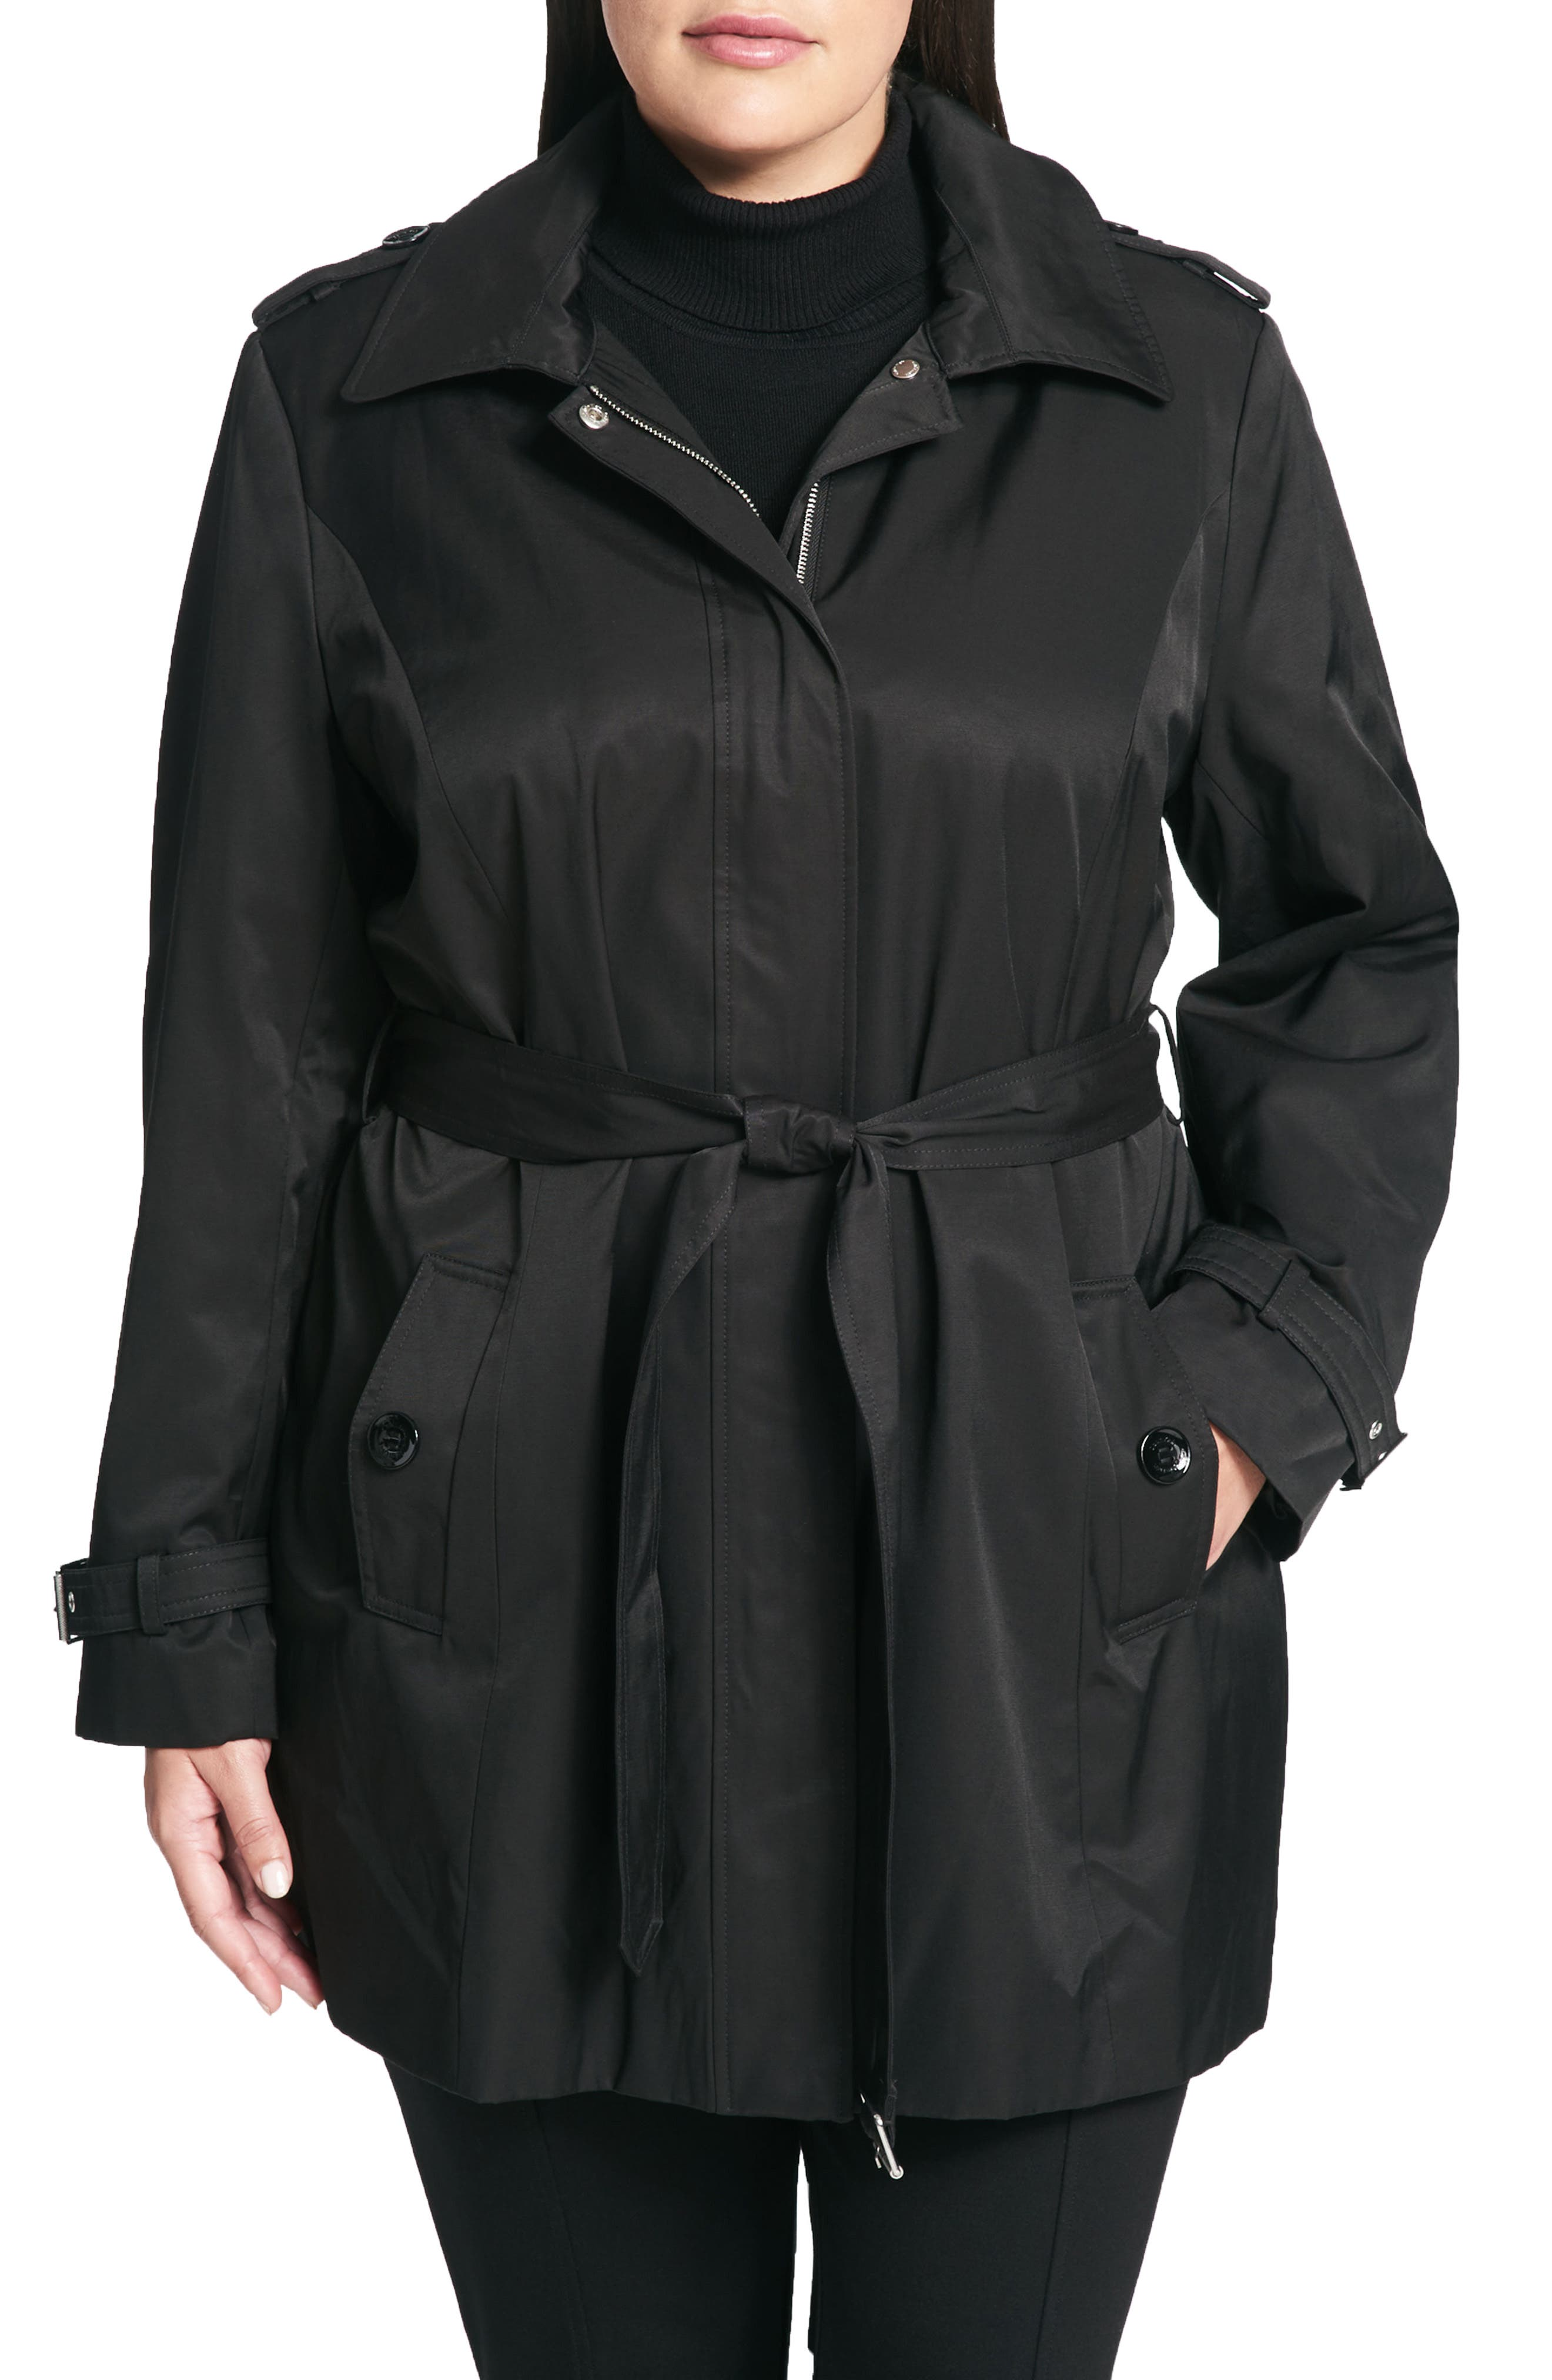 Alternate Image 1 Selected - Calvin Klein Poplin Trench Coat (Plus Size)